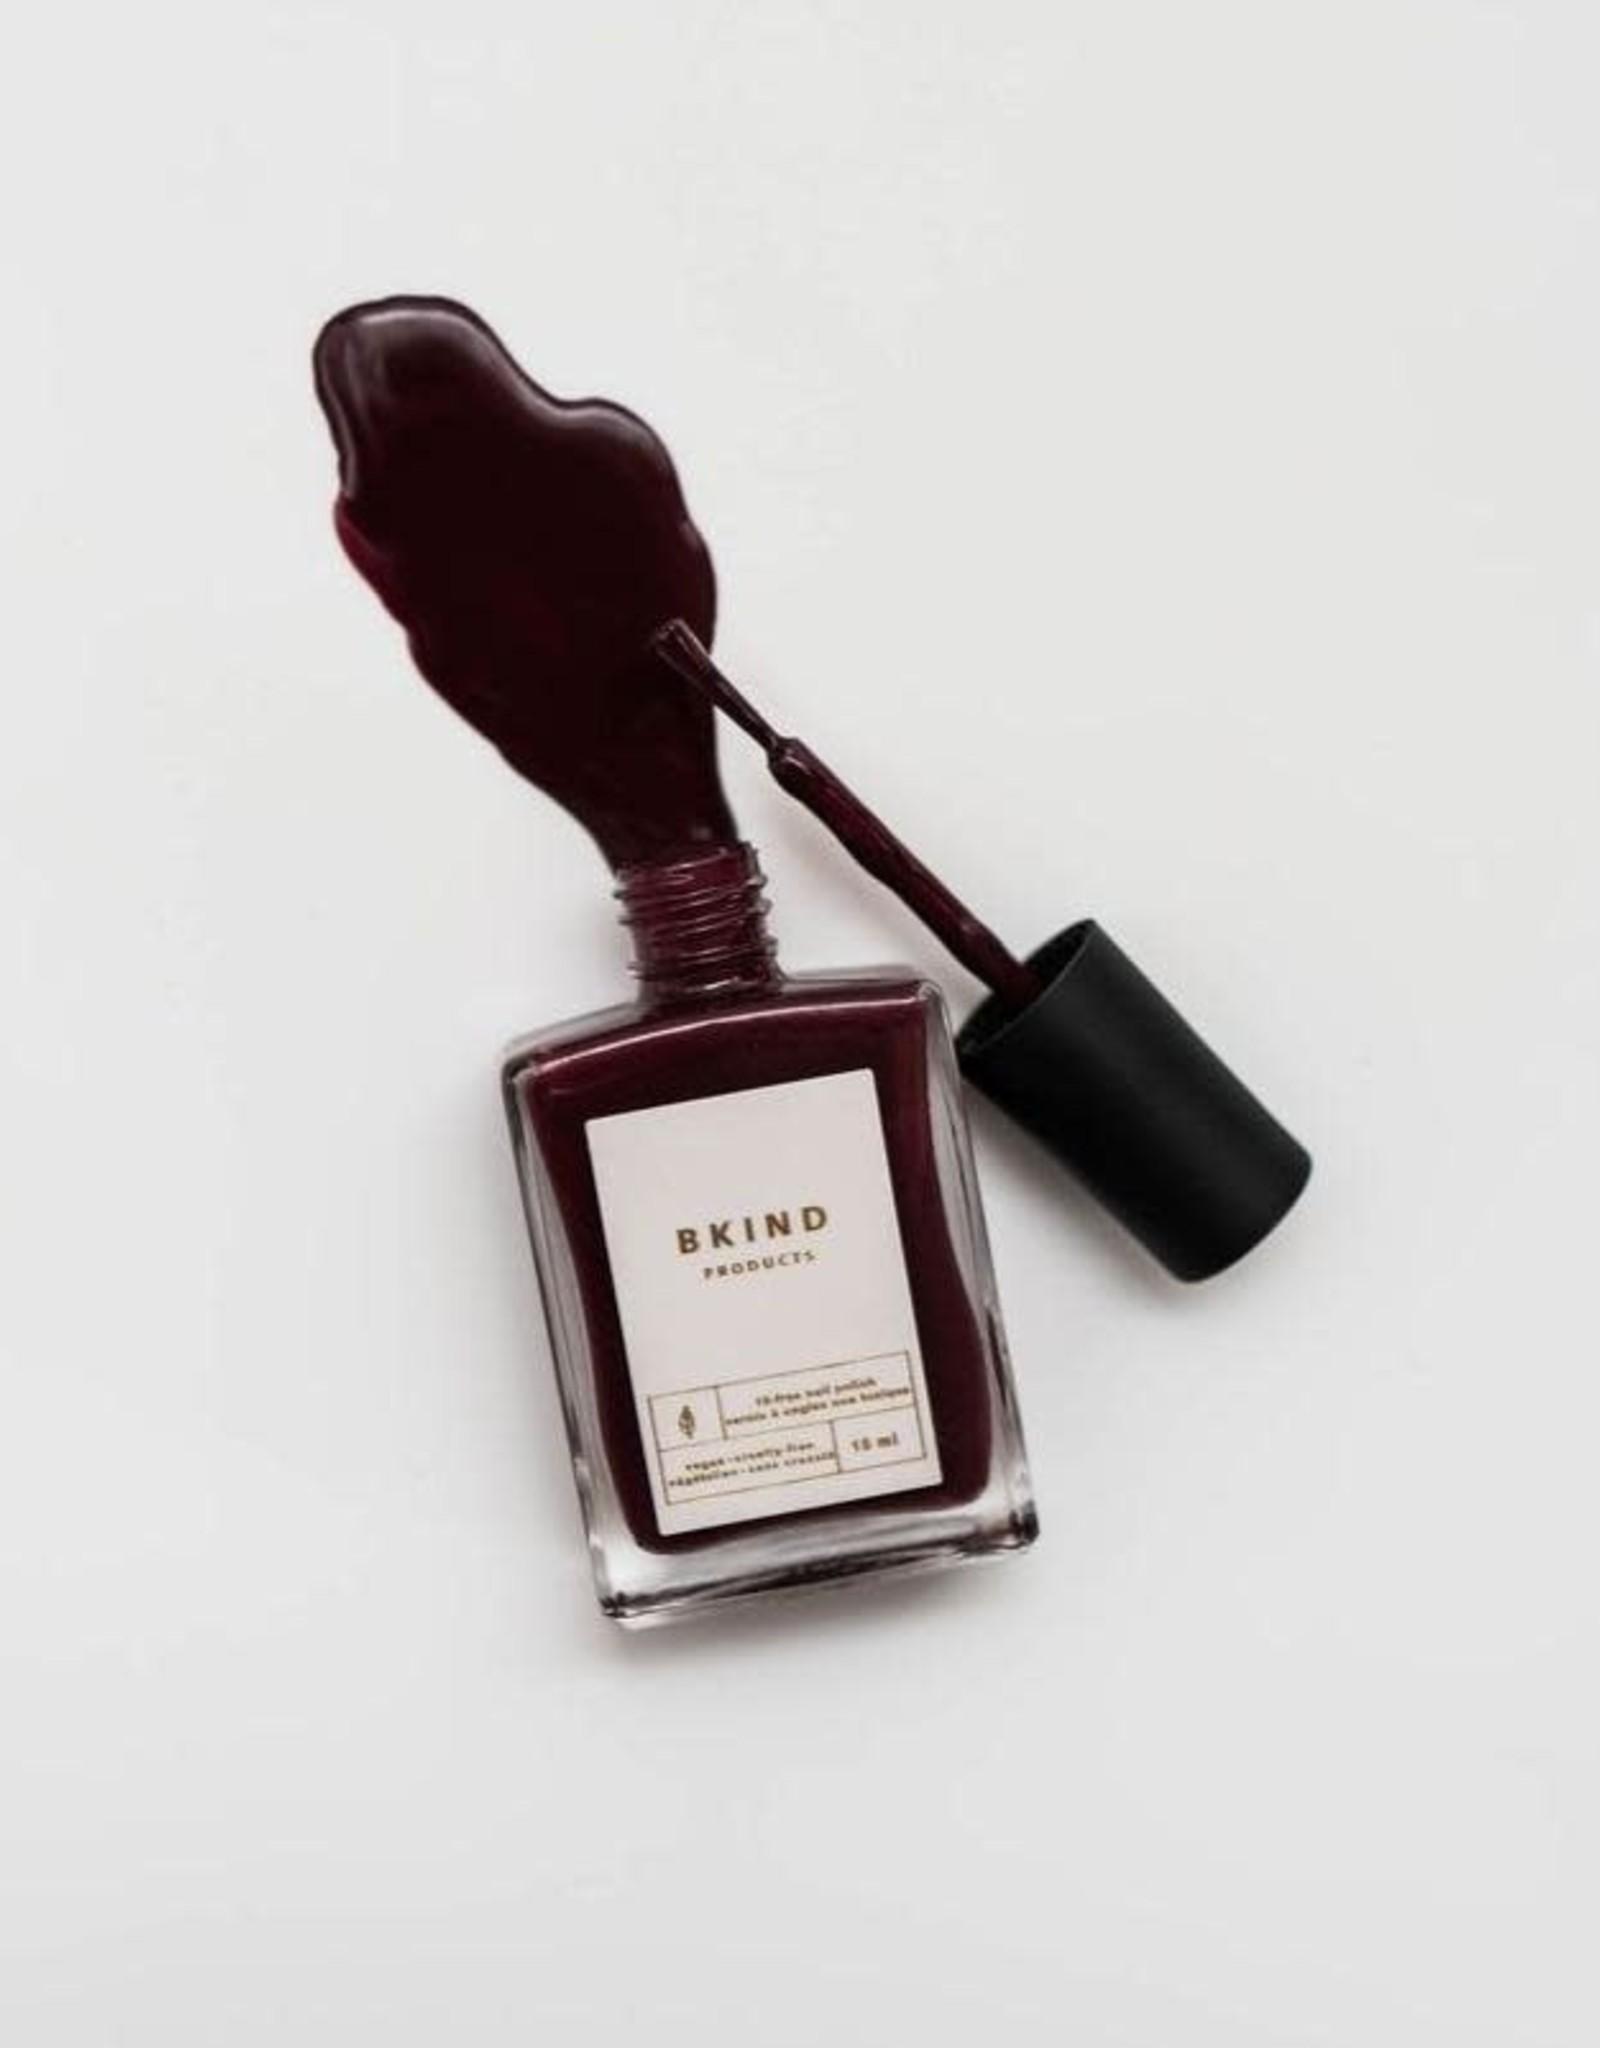 Bkind Vernis à ongles - Paint it brown